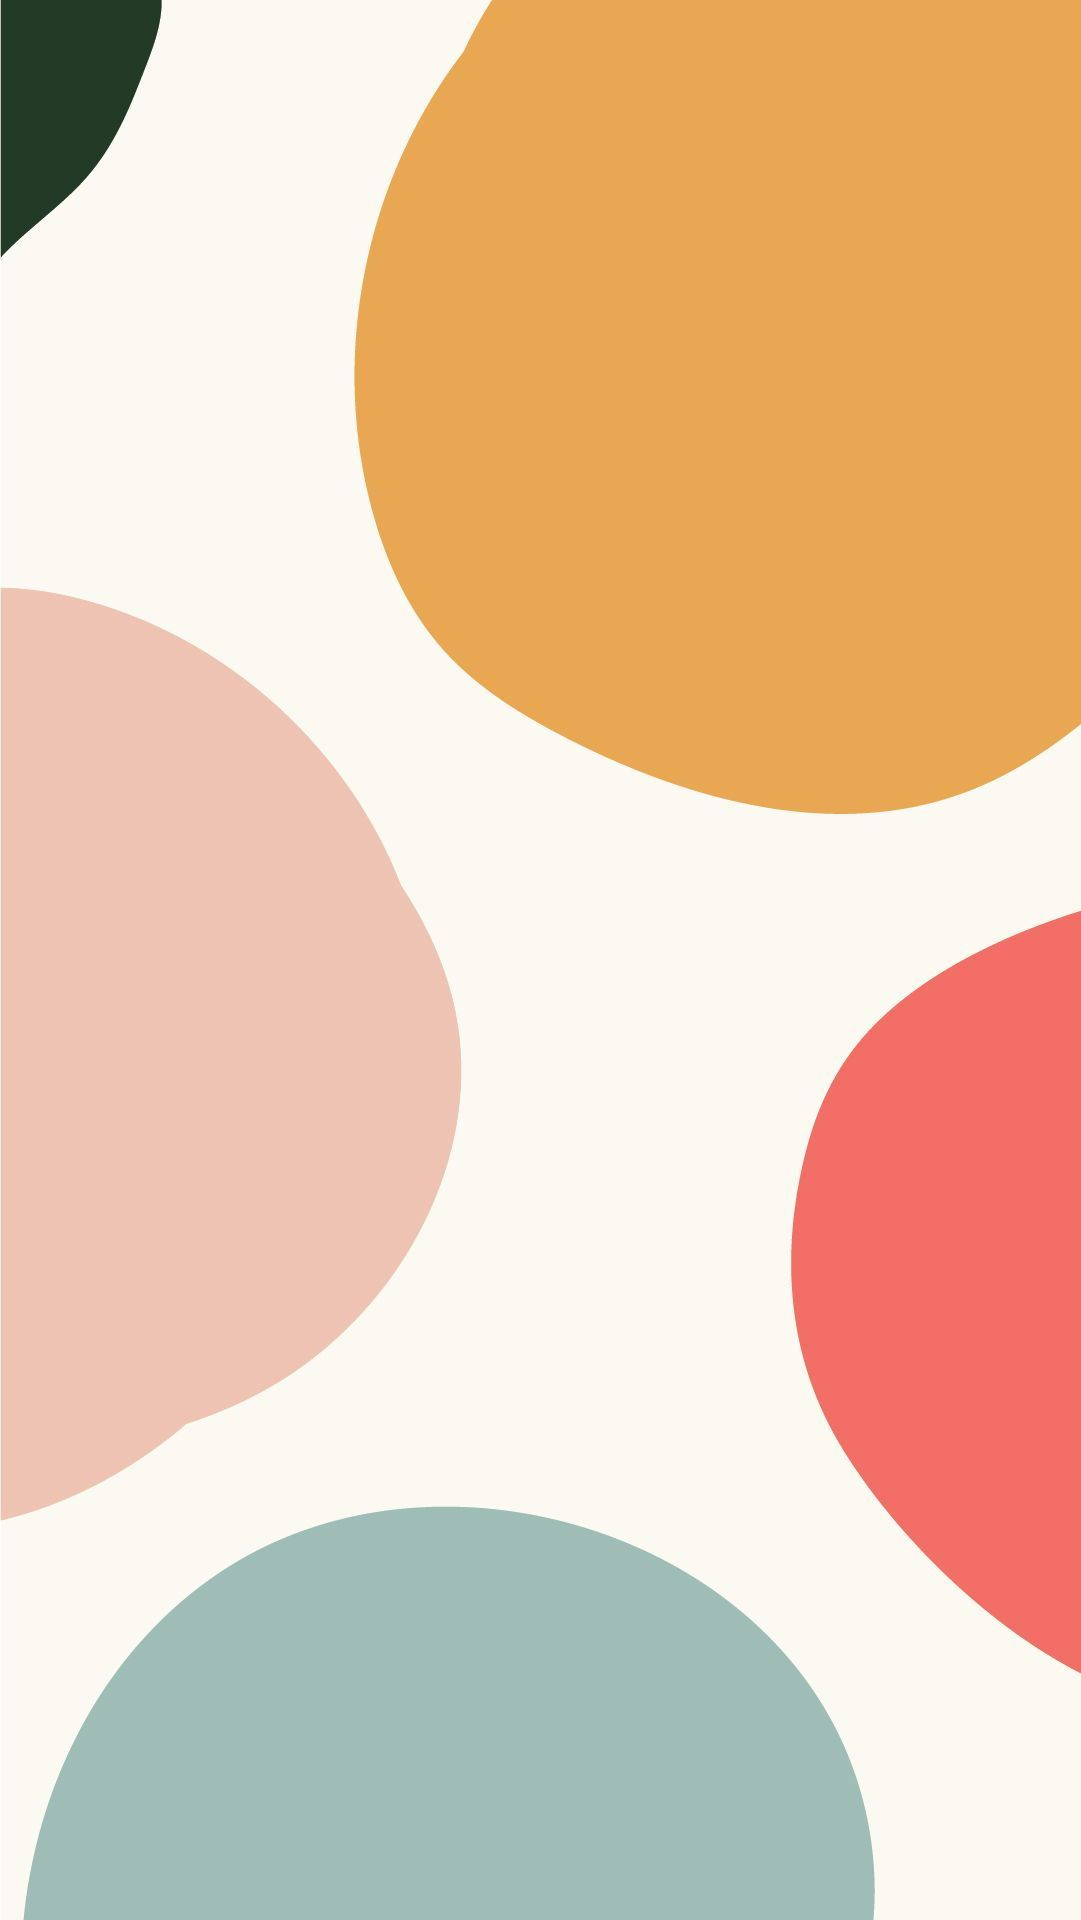 The Kind Store Marca De Belleza Sostenible Abstract Iphone Wallpaper Cute Patterns Wallpaper Pattern Wallpaper